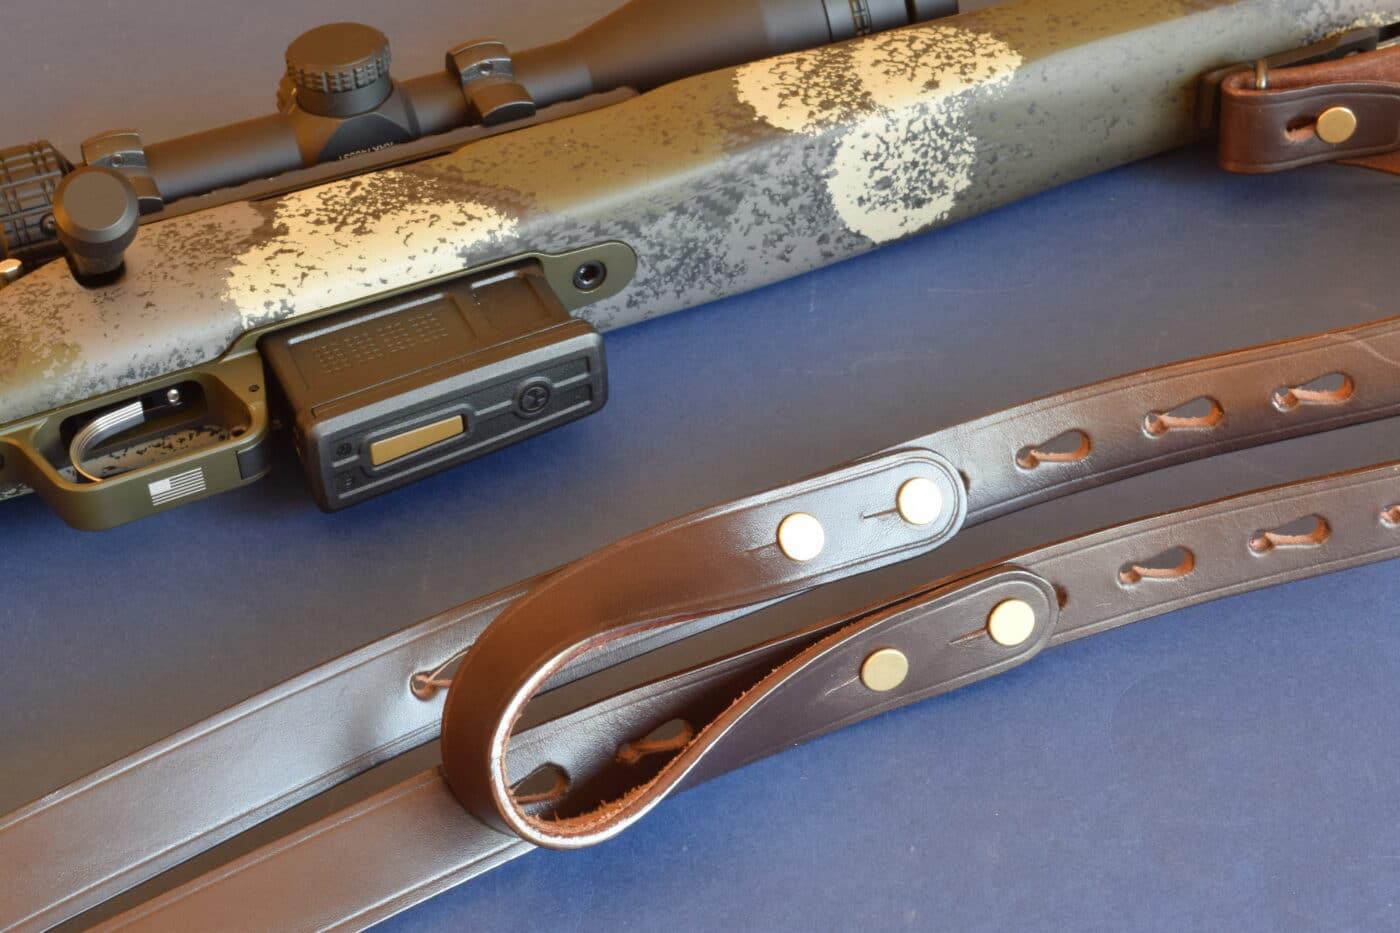 Arm loop of Galco Ching sling